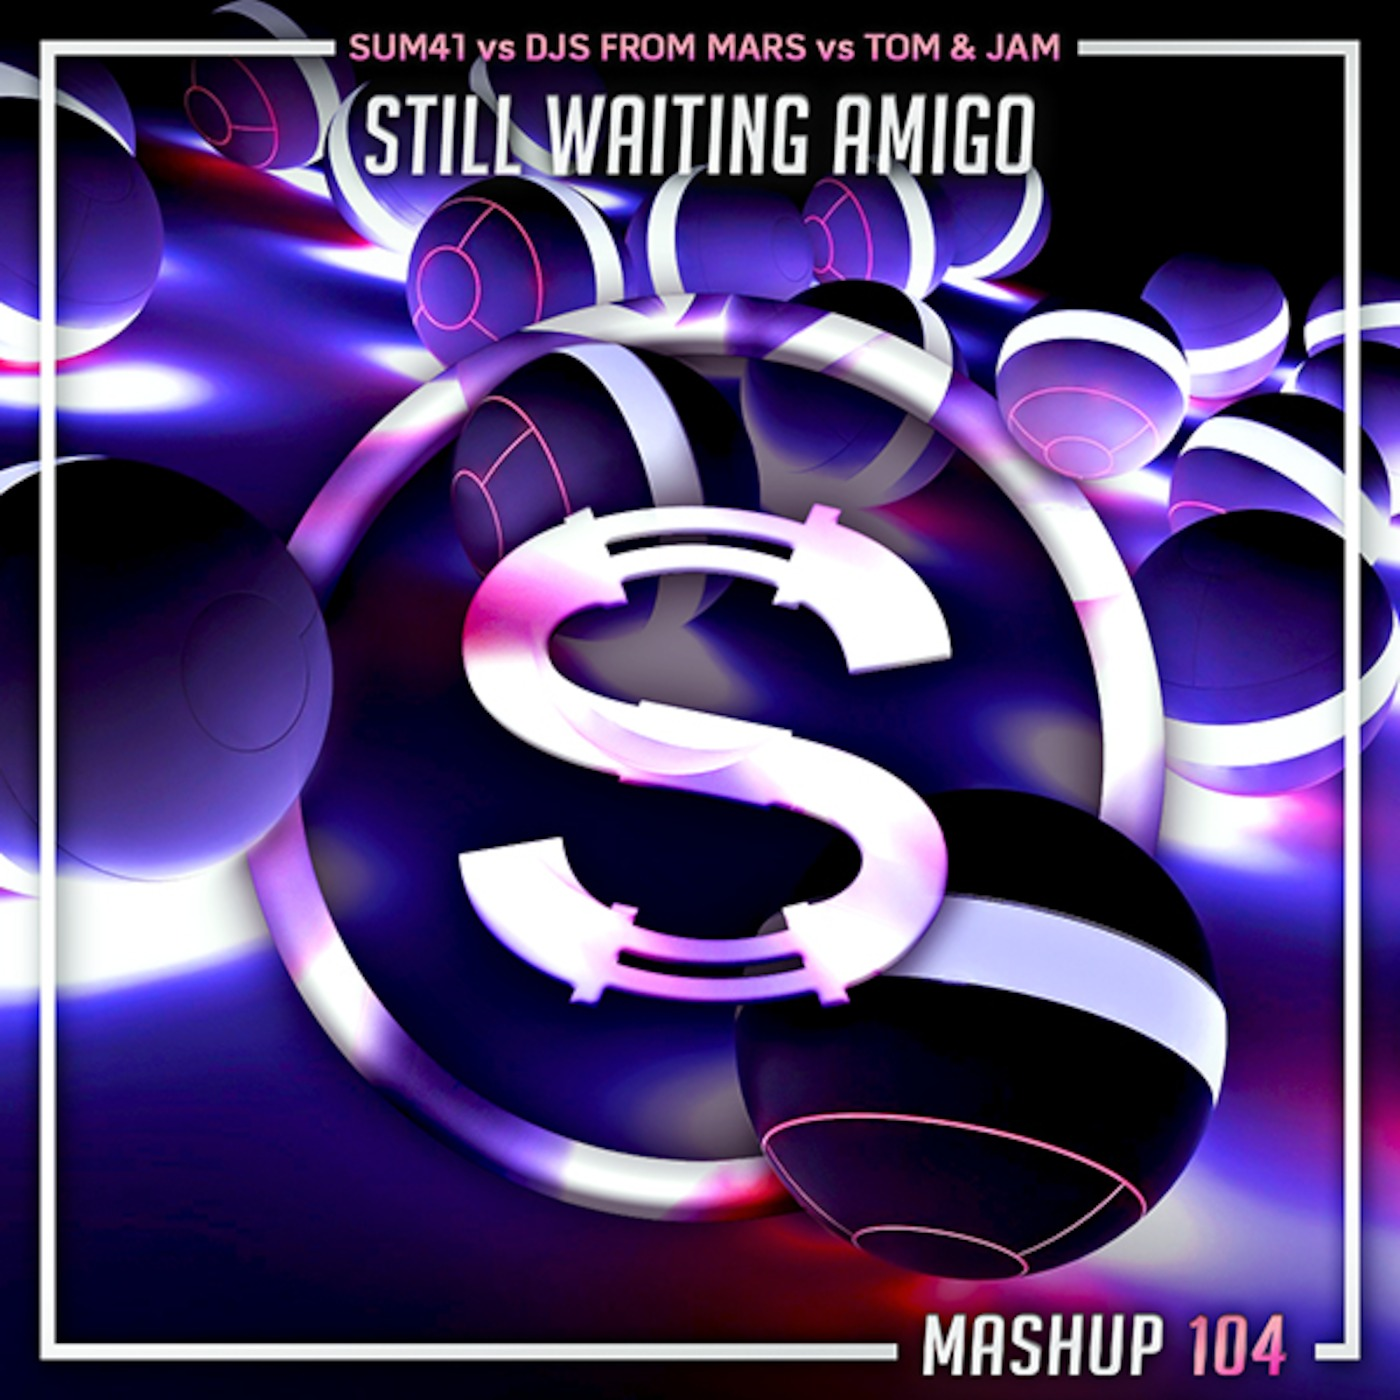 Sum41 vs Djs From Mars vs Tom x Jam - Still Waiting Amigo (Da Sylva mashup)